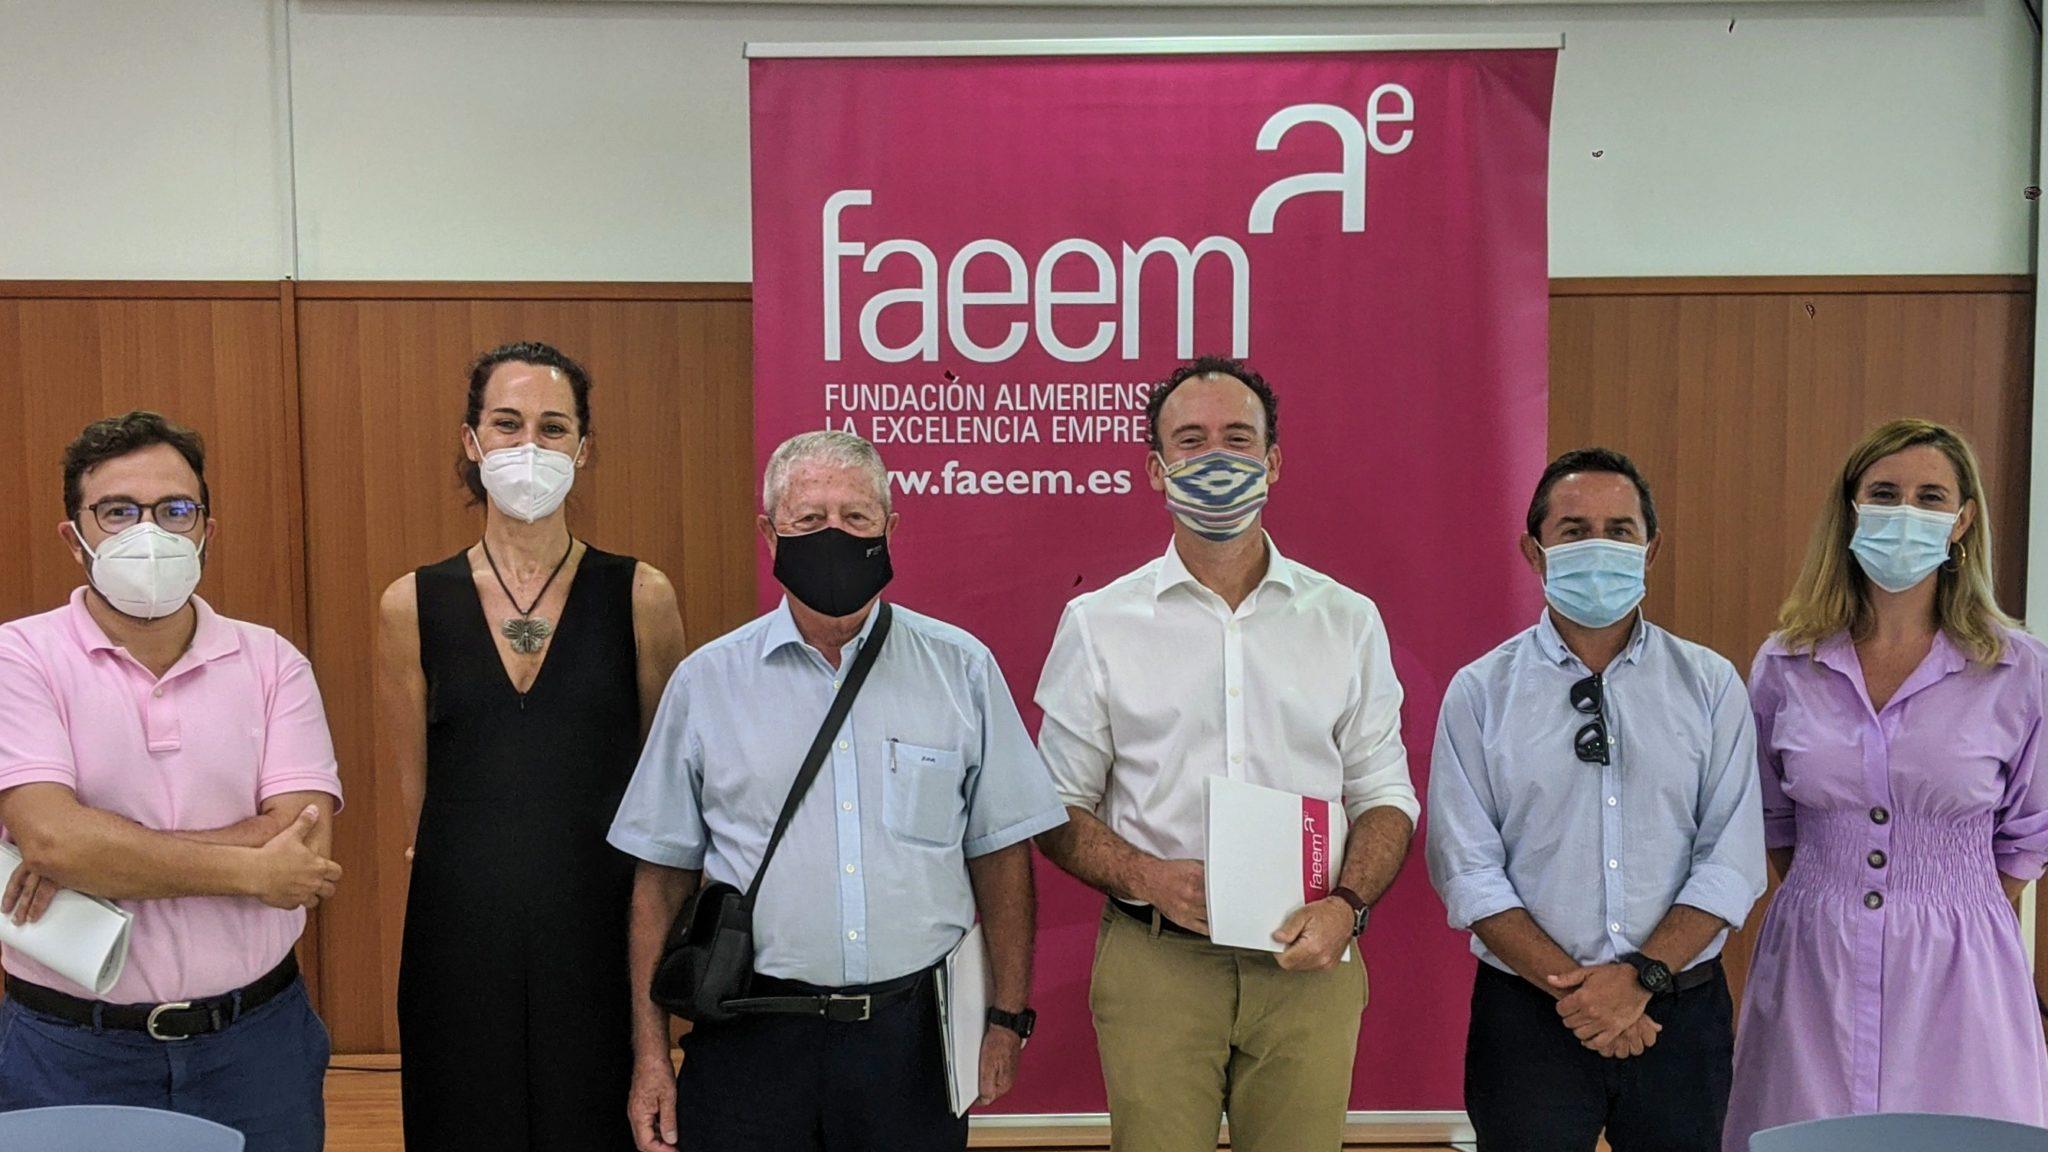 PVpharm joins FAEEM